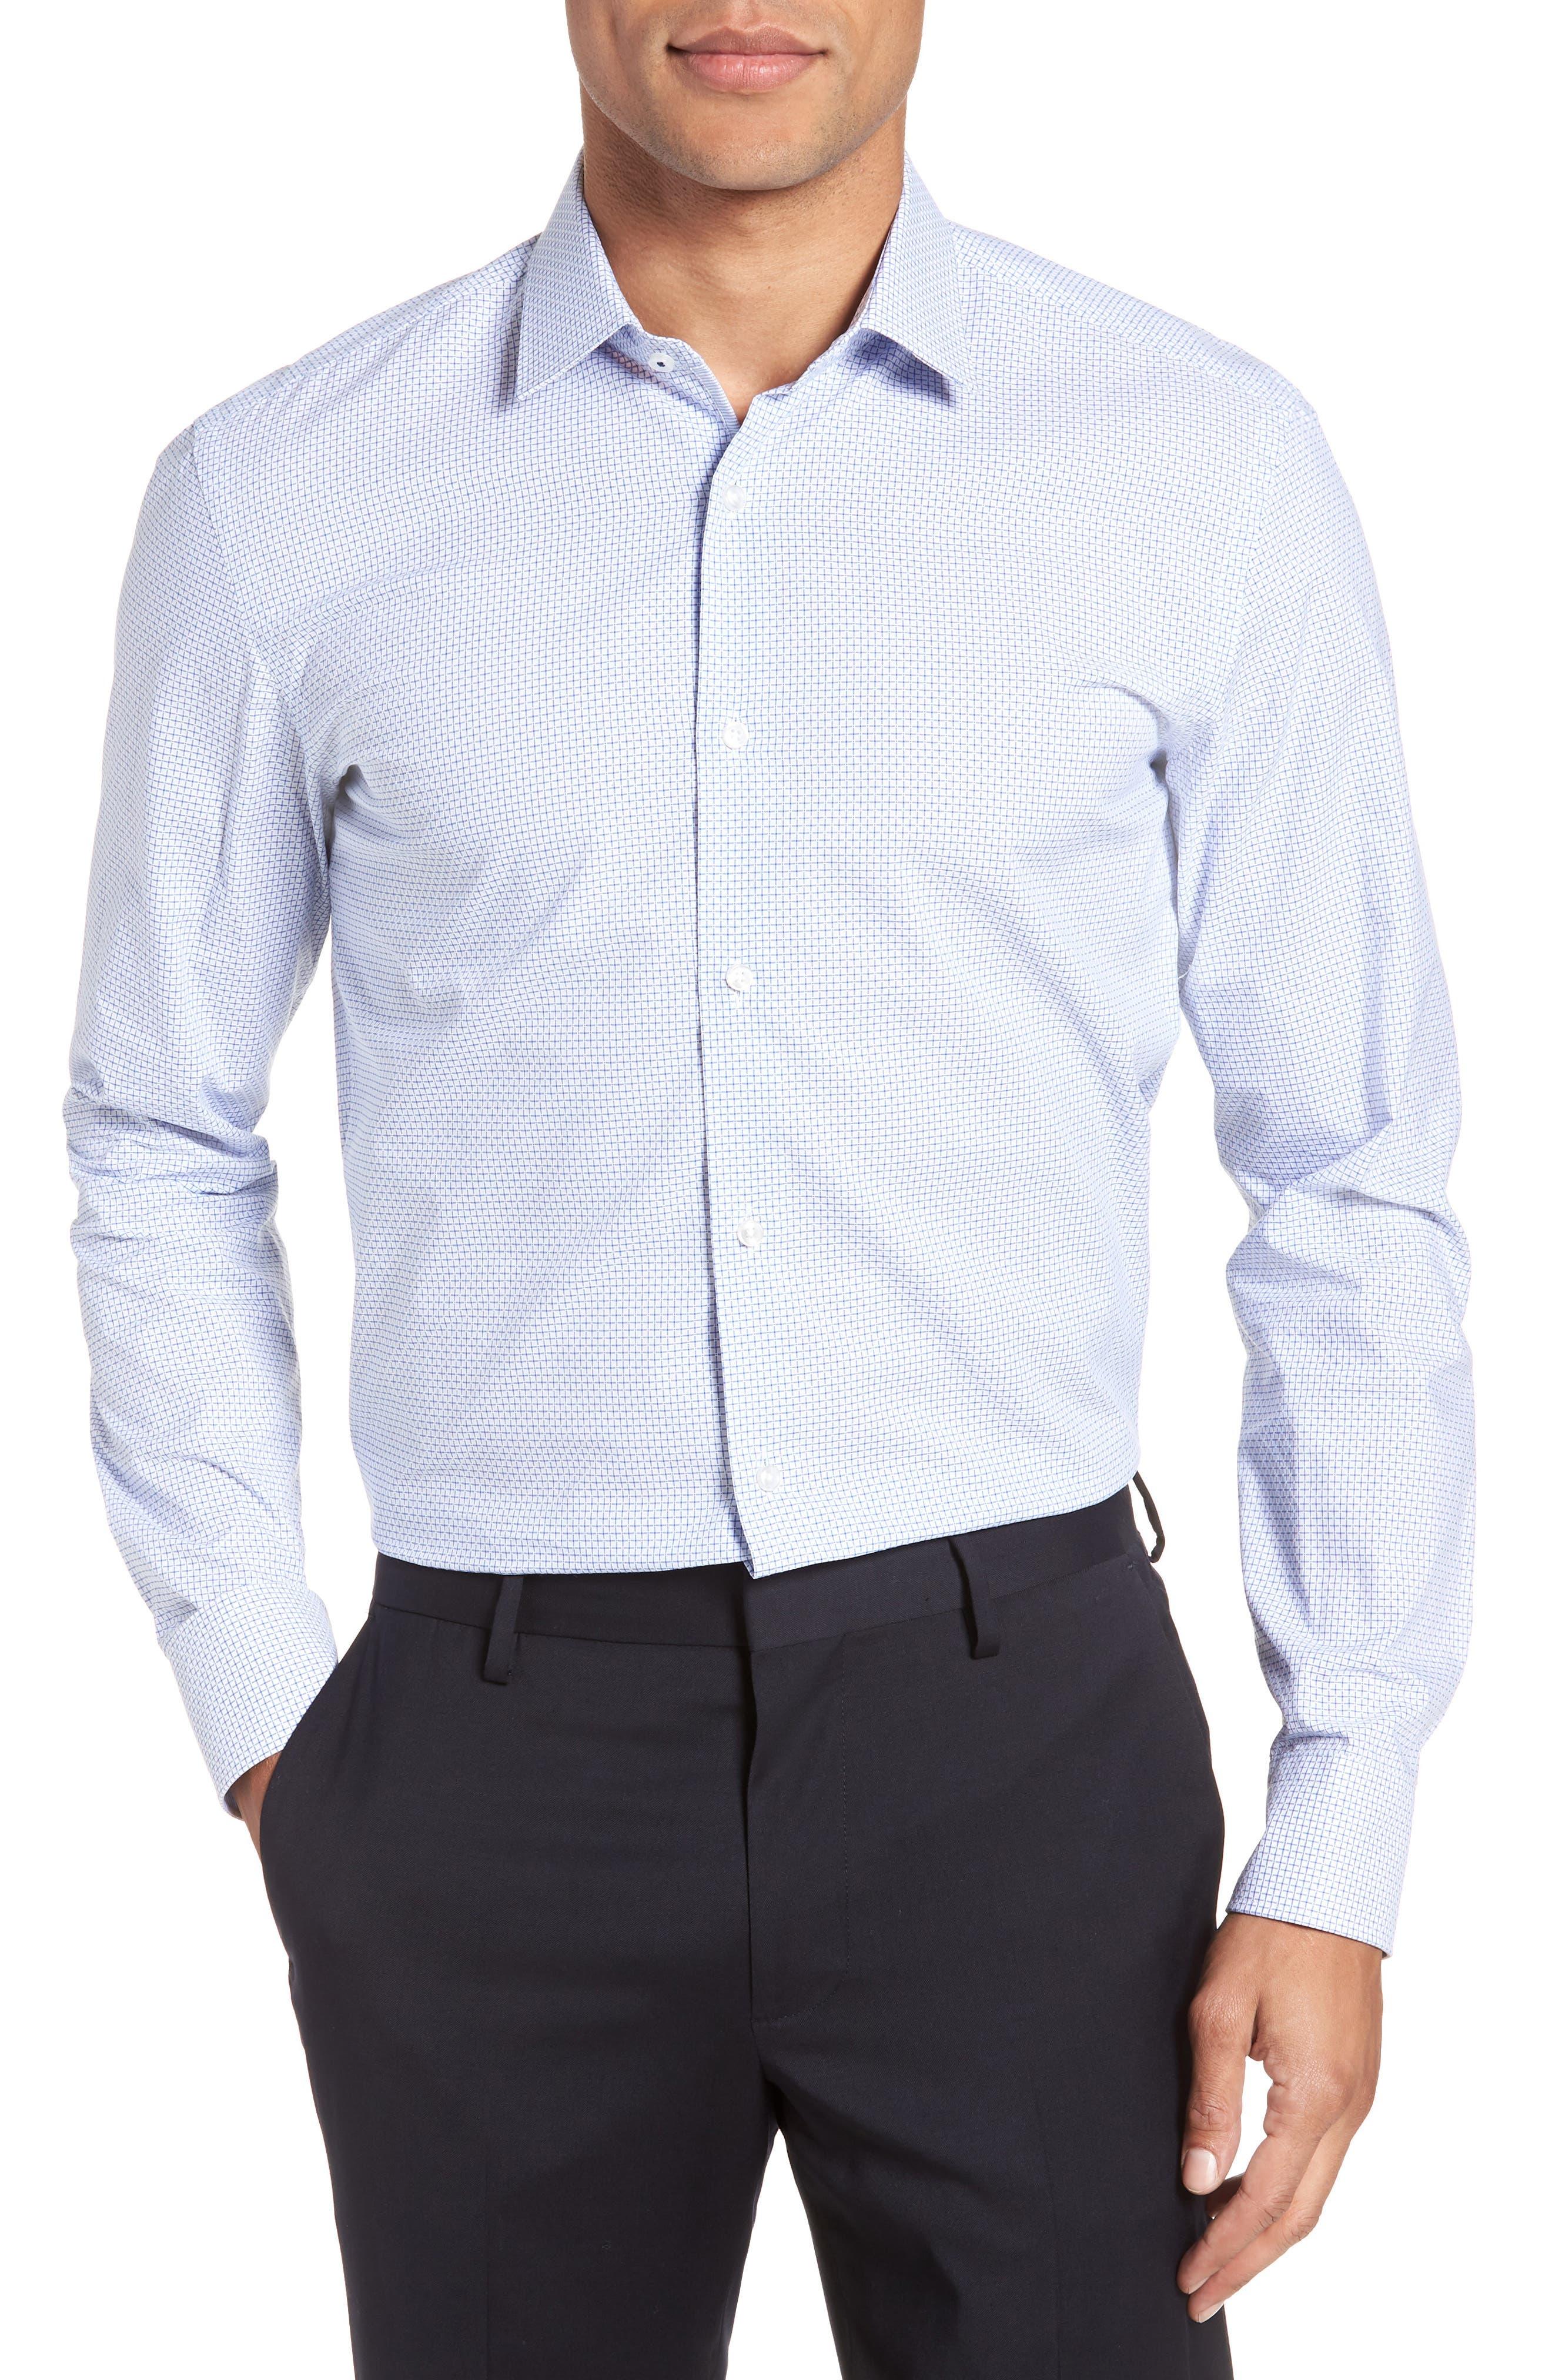 Jesse Slim Fit Check Dress Shirt,                             Main thumbnail 1, color,                             Blue